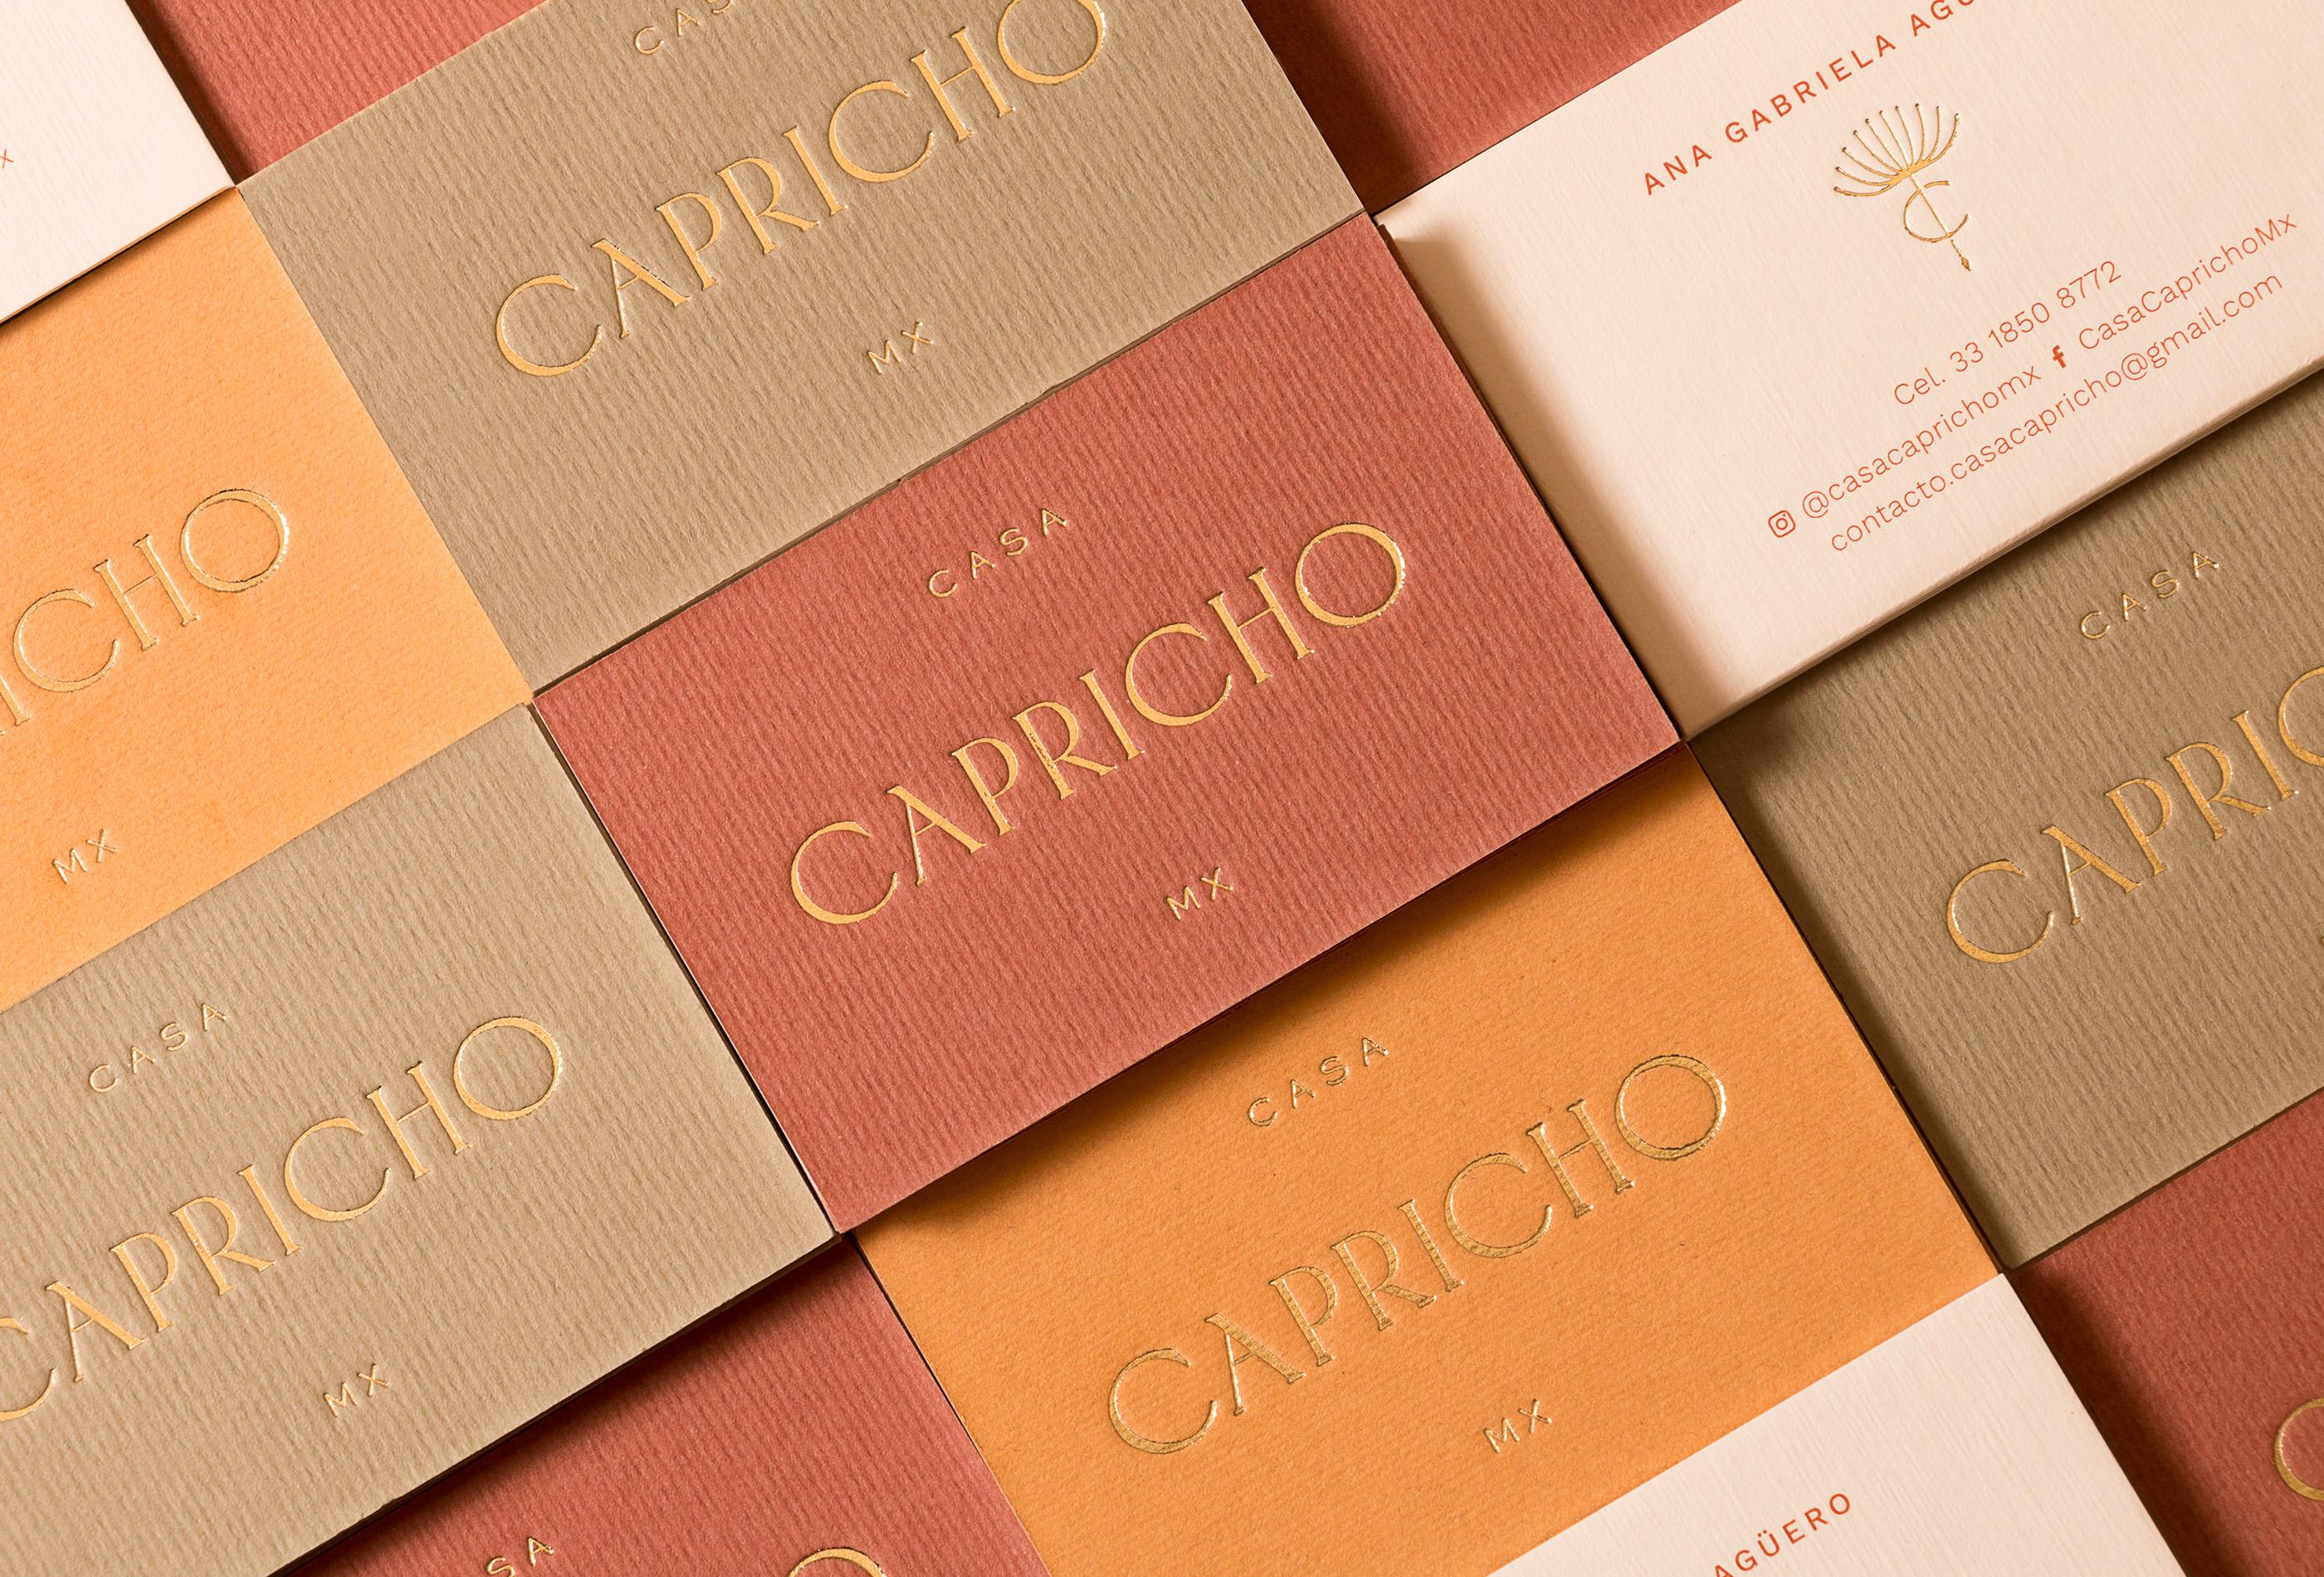 Estudio Albino Create Casa Capricho Brand and Packaging Design